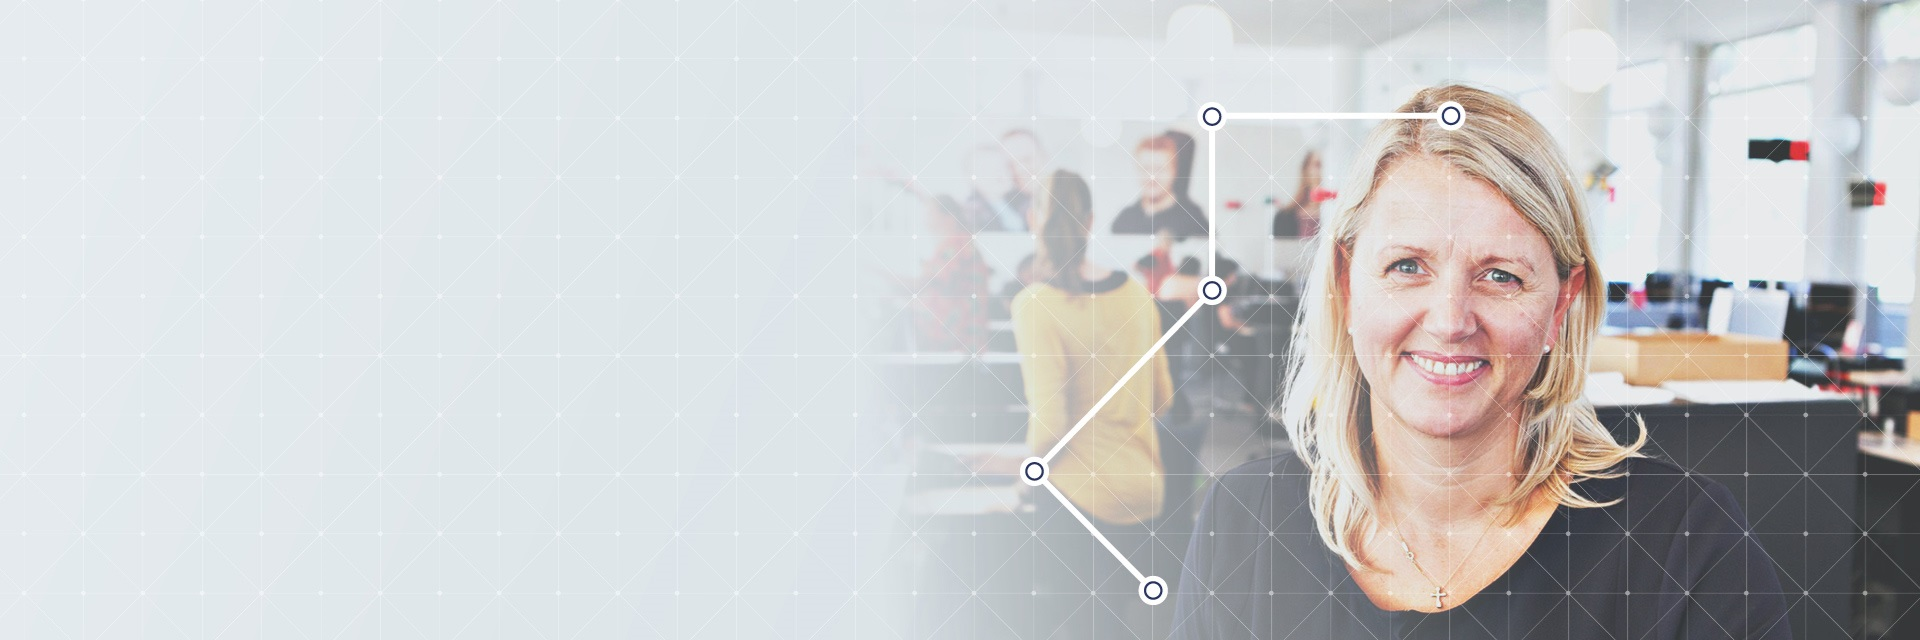 Customer-IQ_Experts-panel_Aarhus_Hero.jpg